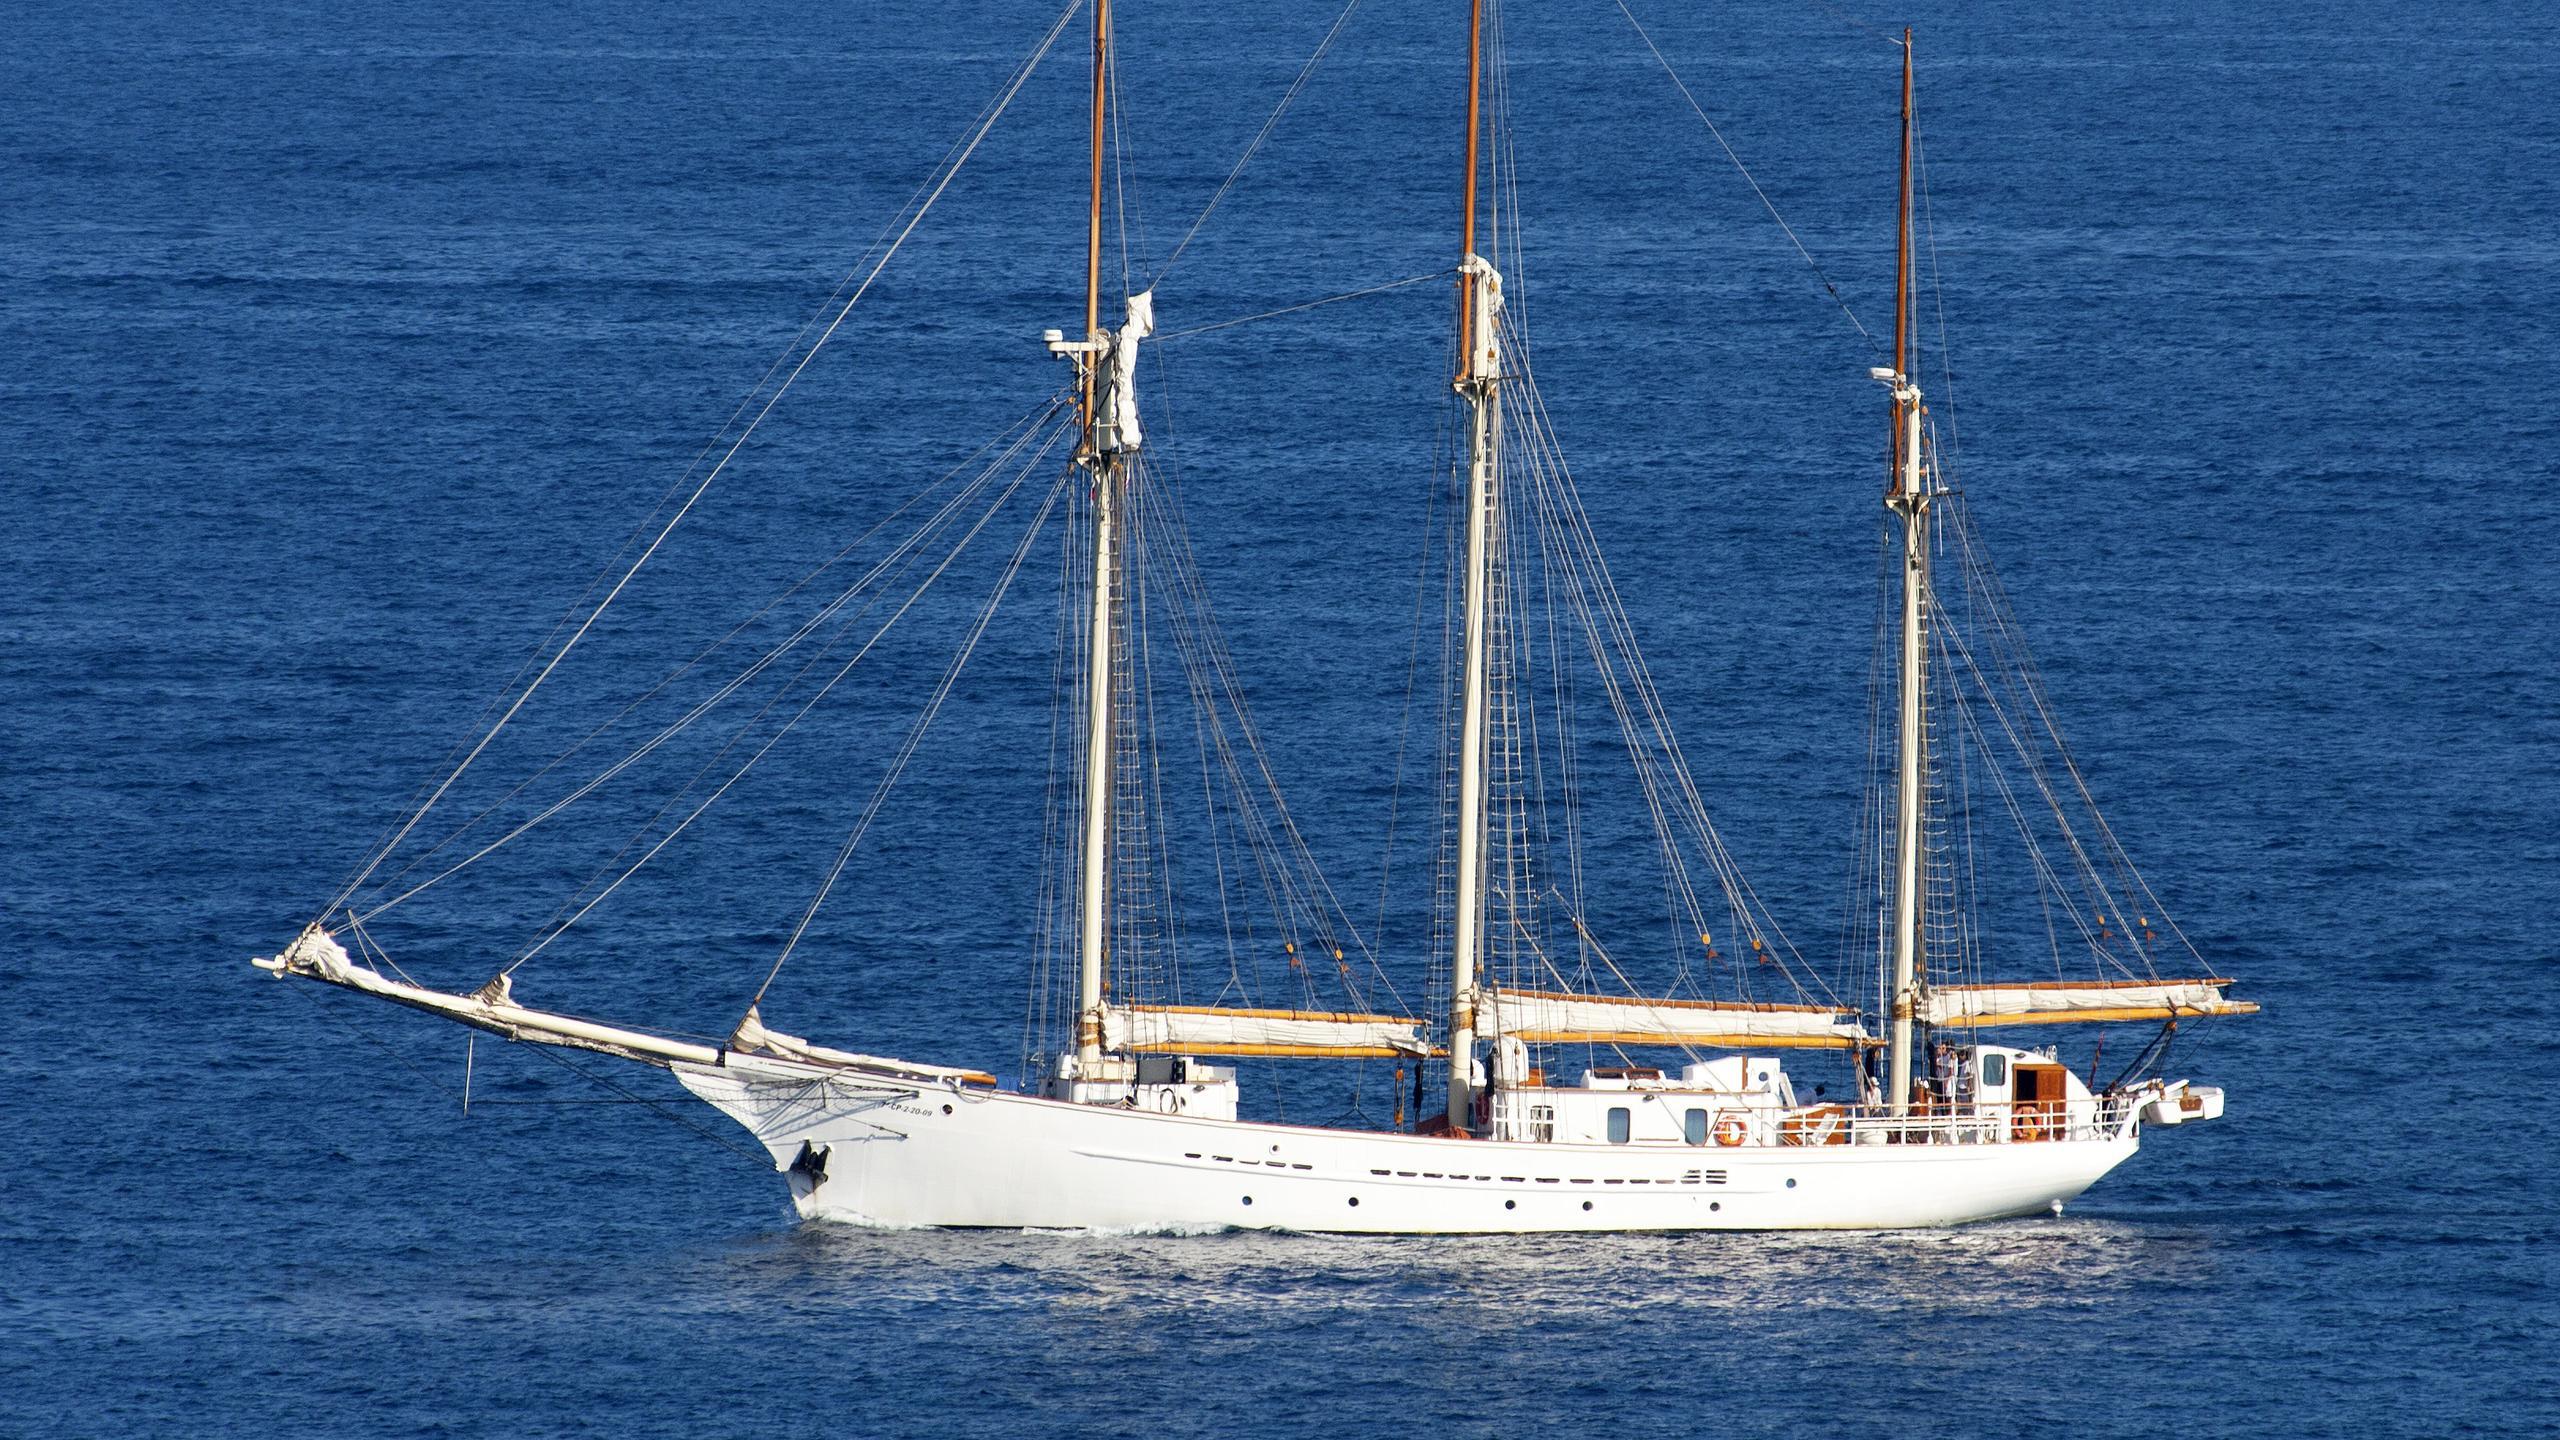 blue-c1-sailing-yacht-feab-marstrandsverken-1991-44m-profile